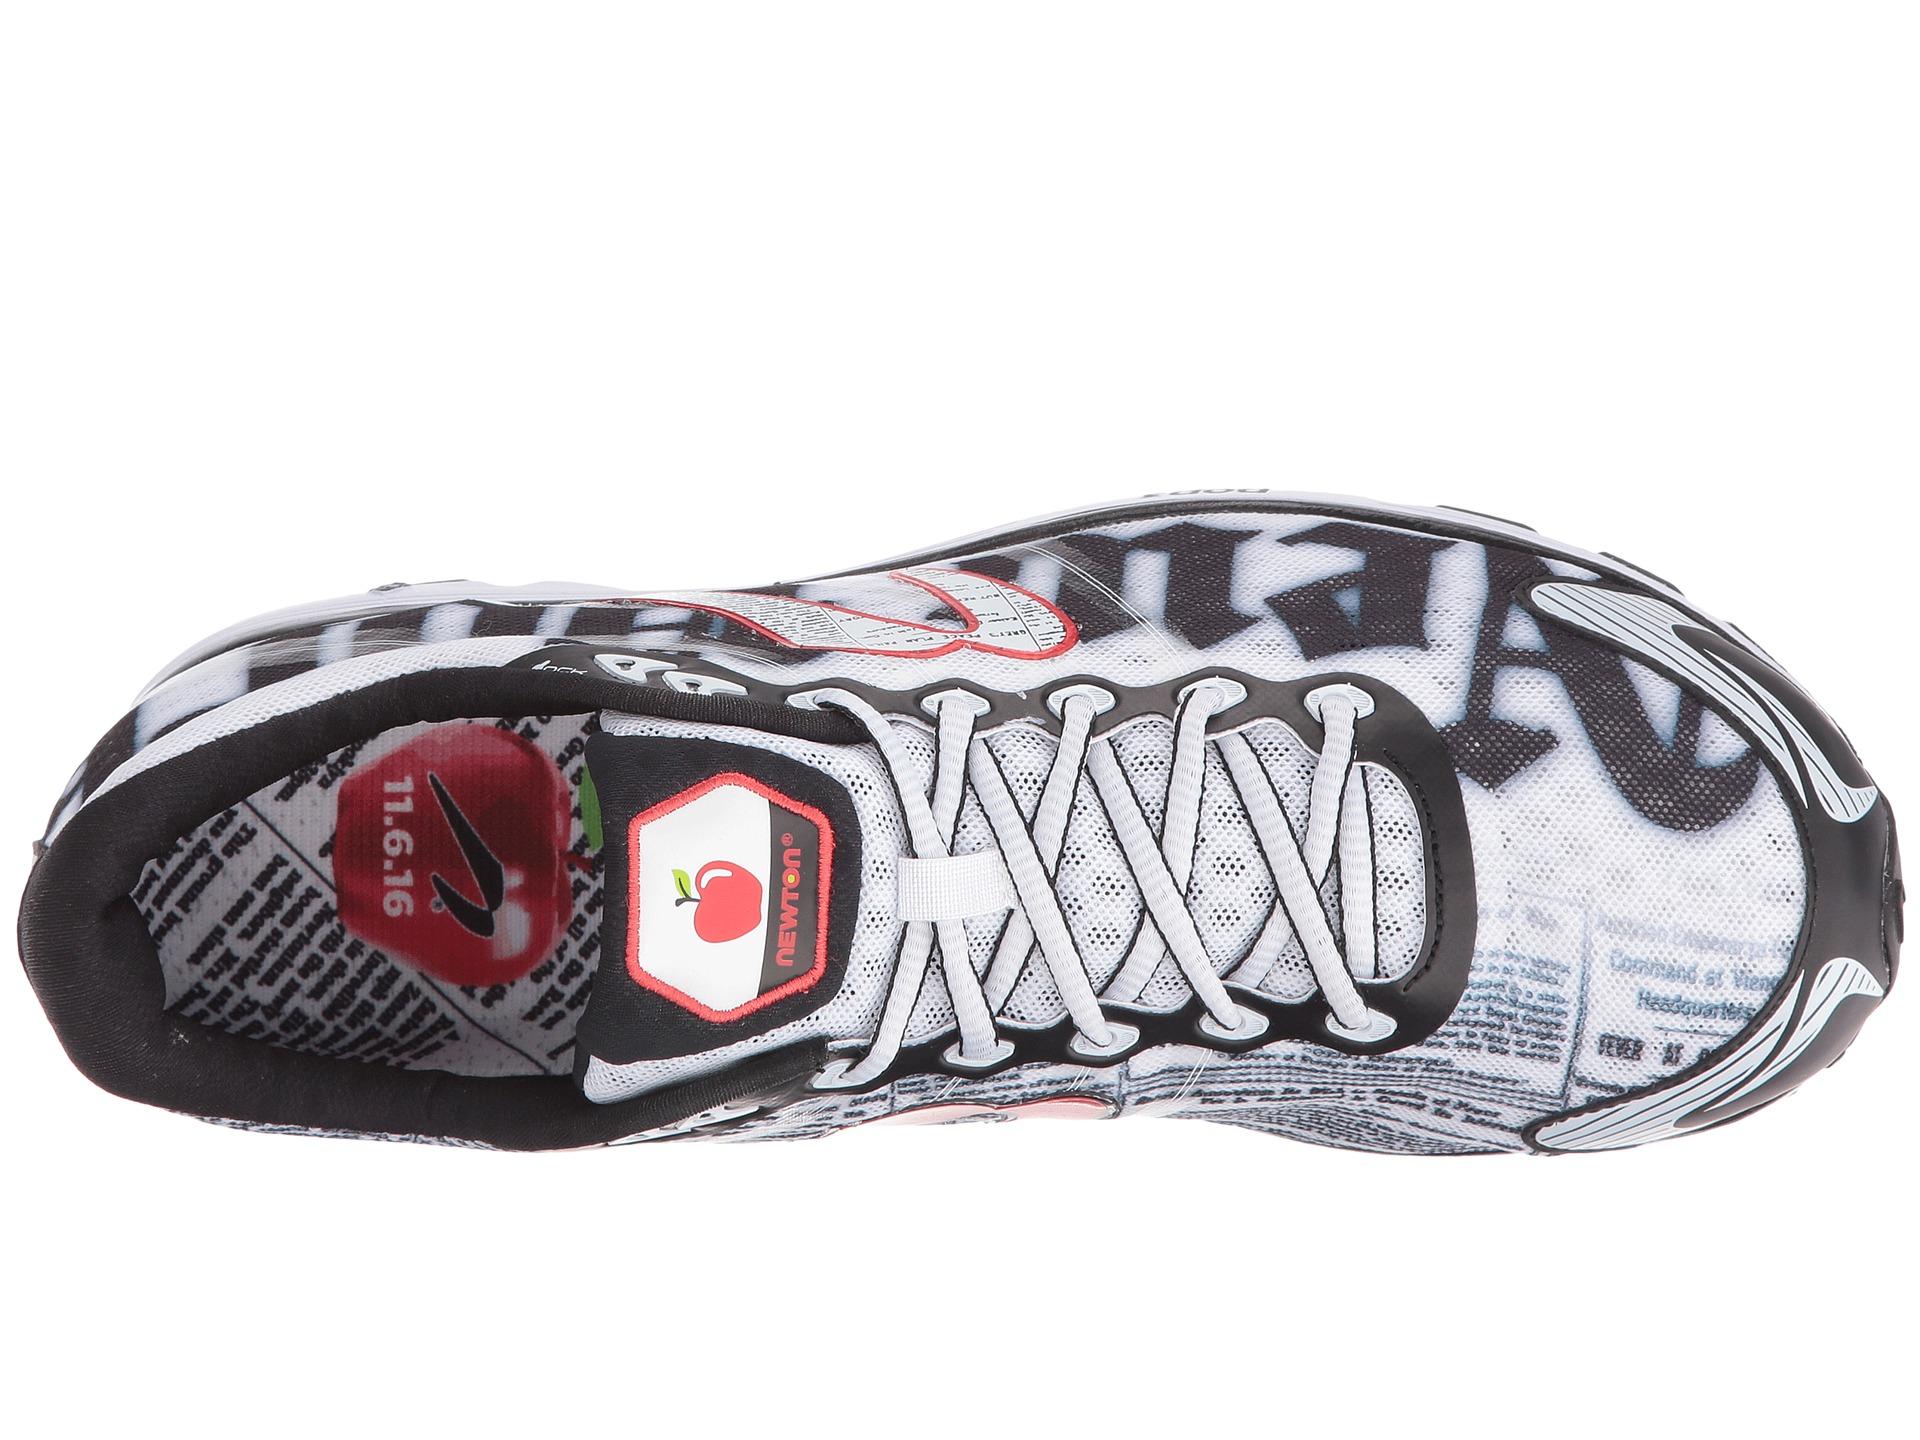 Newton Running Shoes Perth